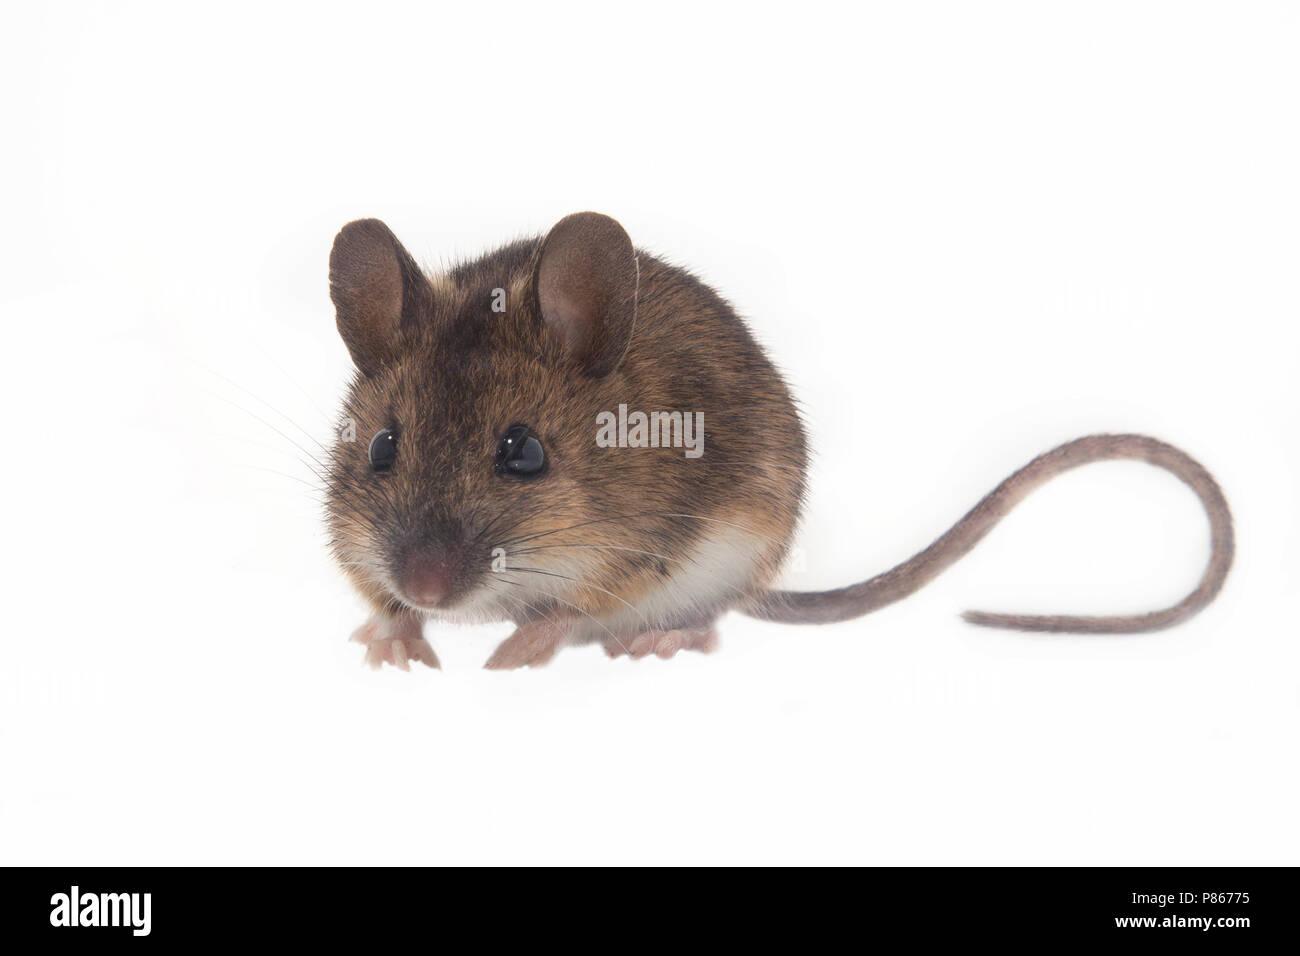 Bosmuis met witte achtergrond - Stock Image